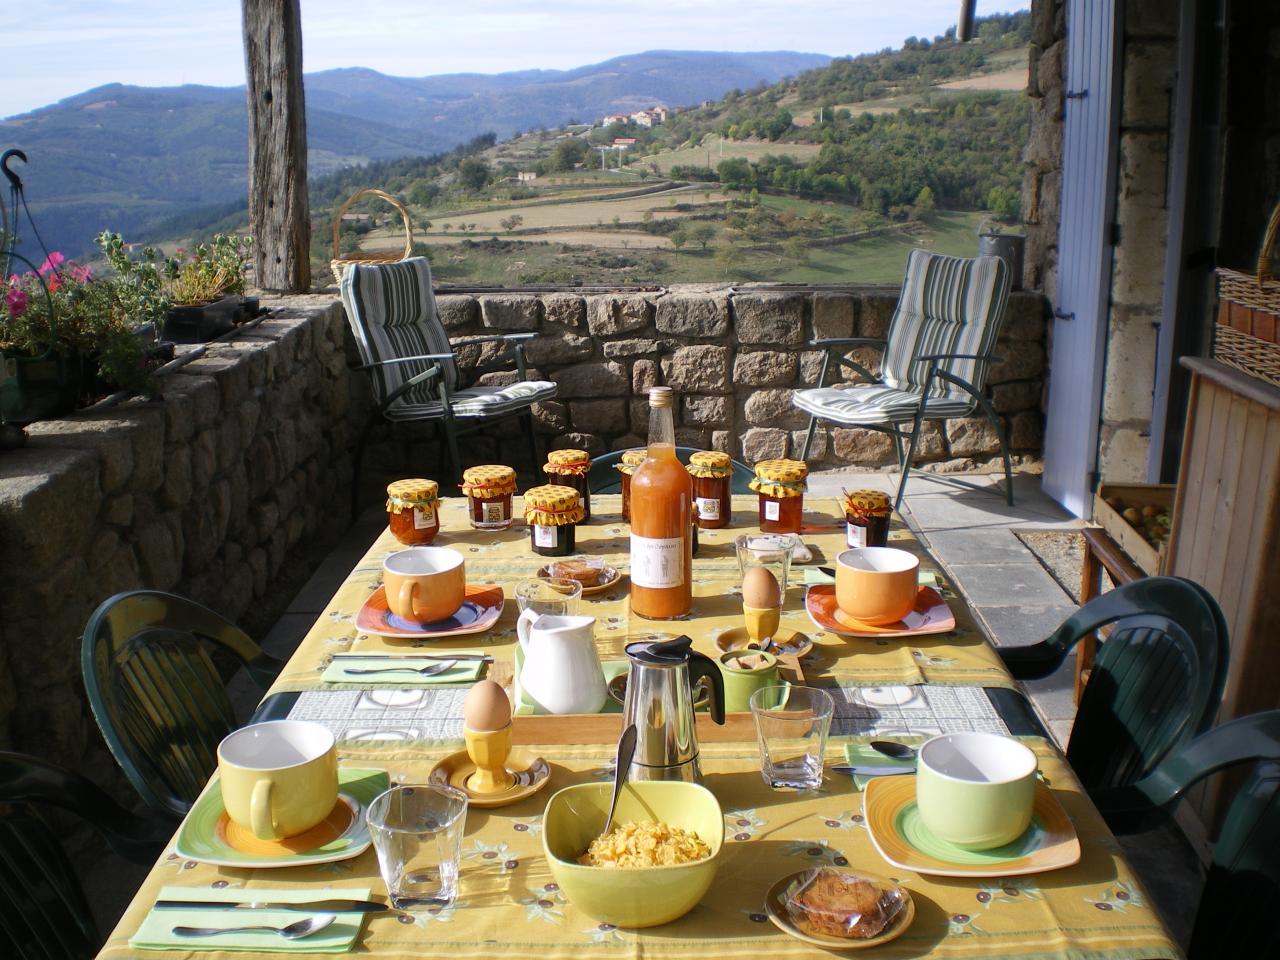 Mercredi 20 août Petit-dejeuner-sur-la-terrasse